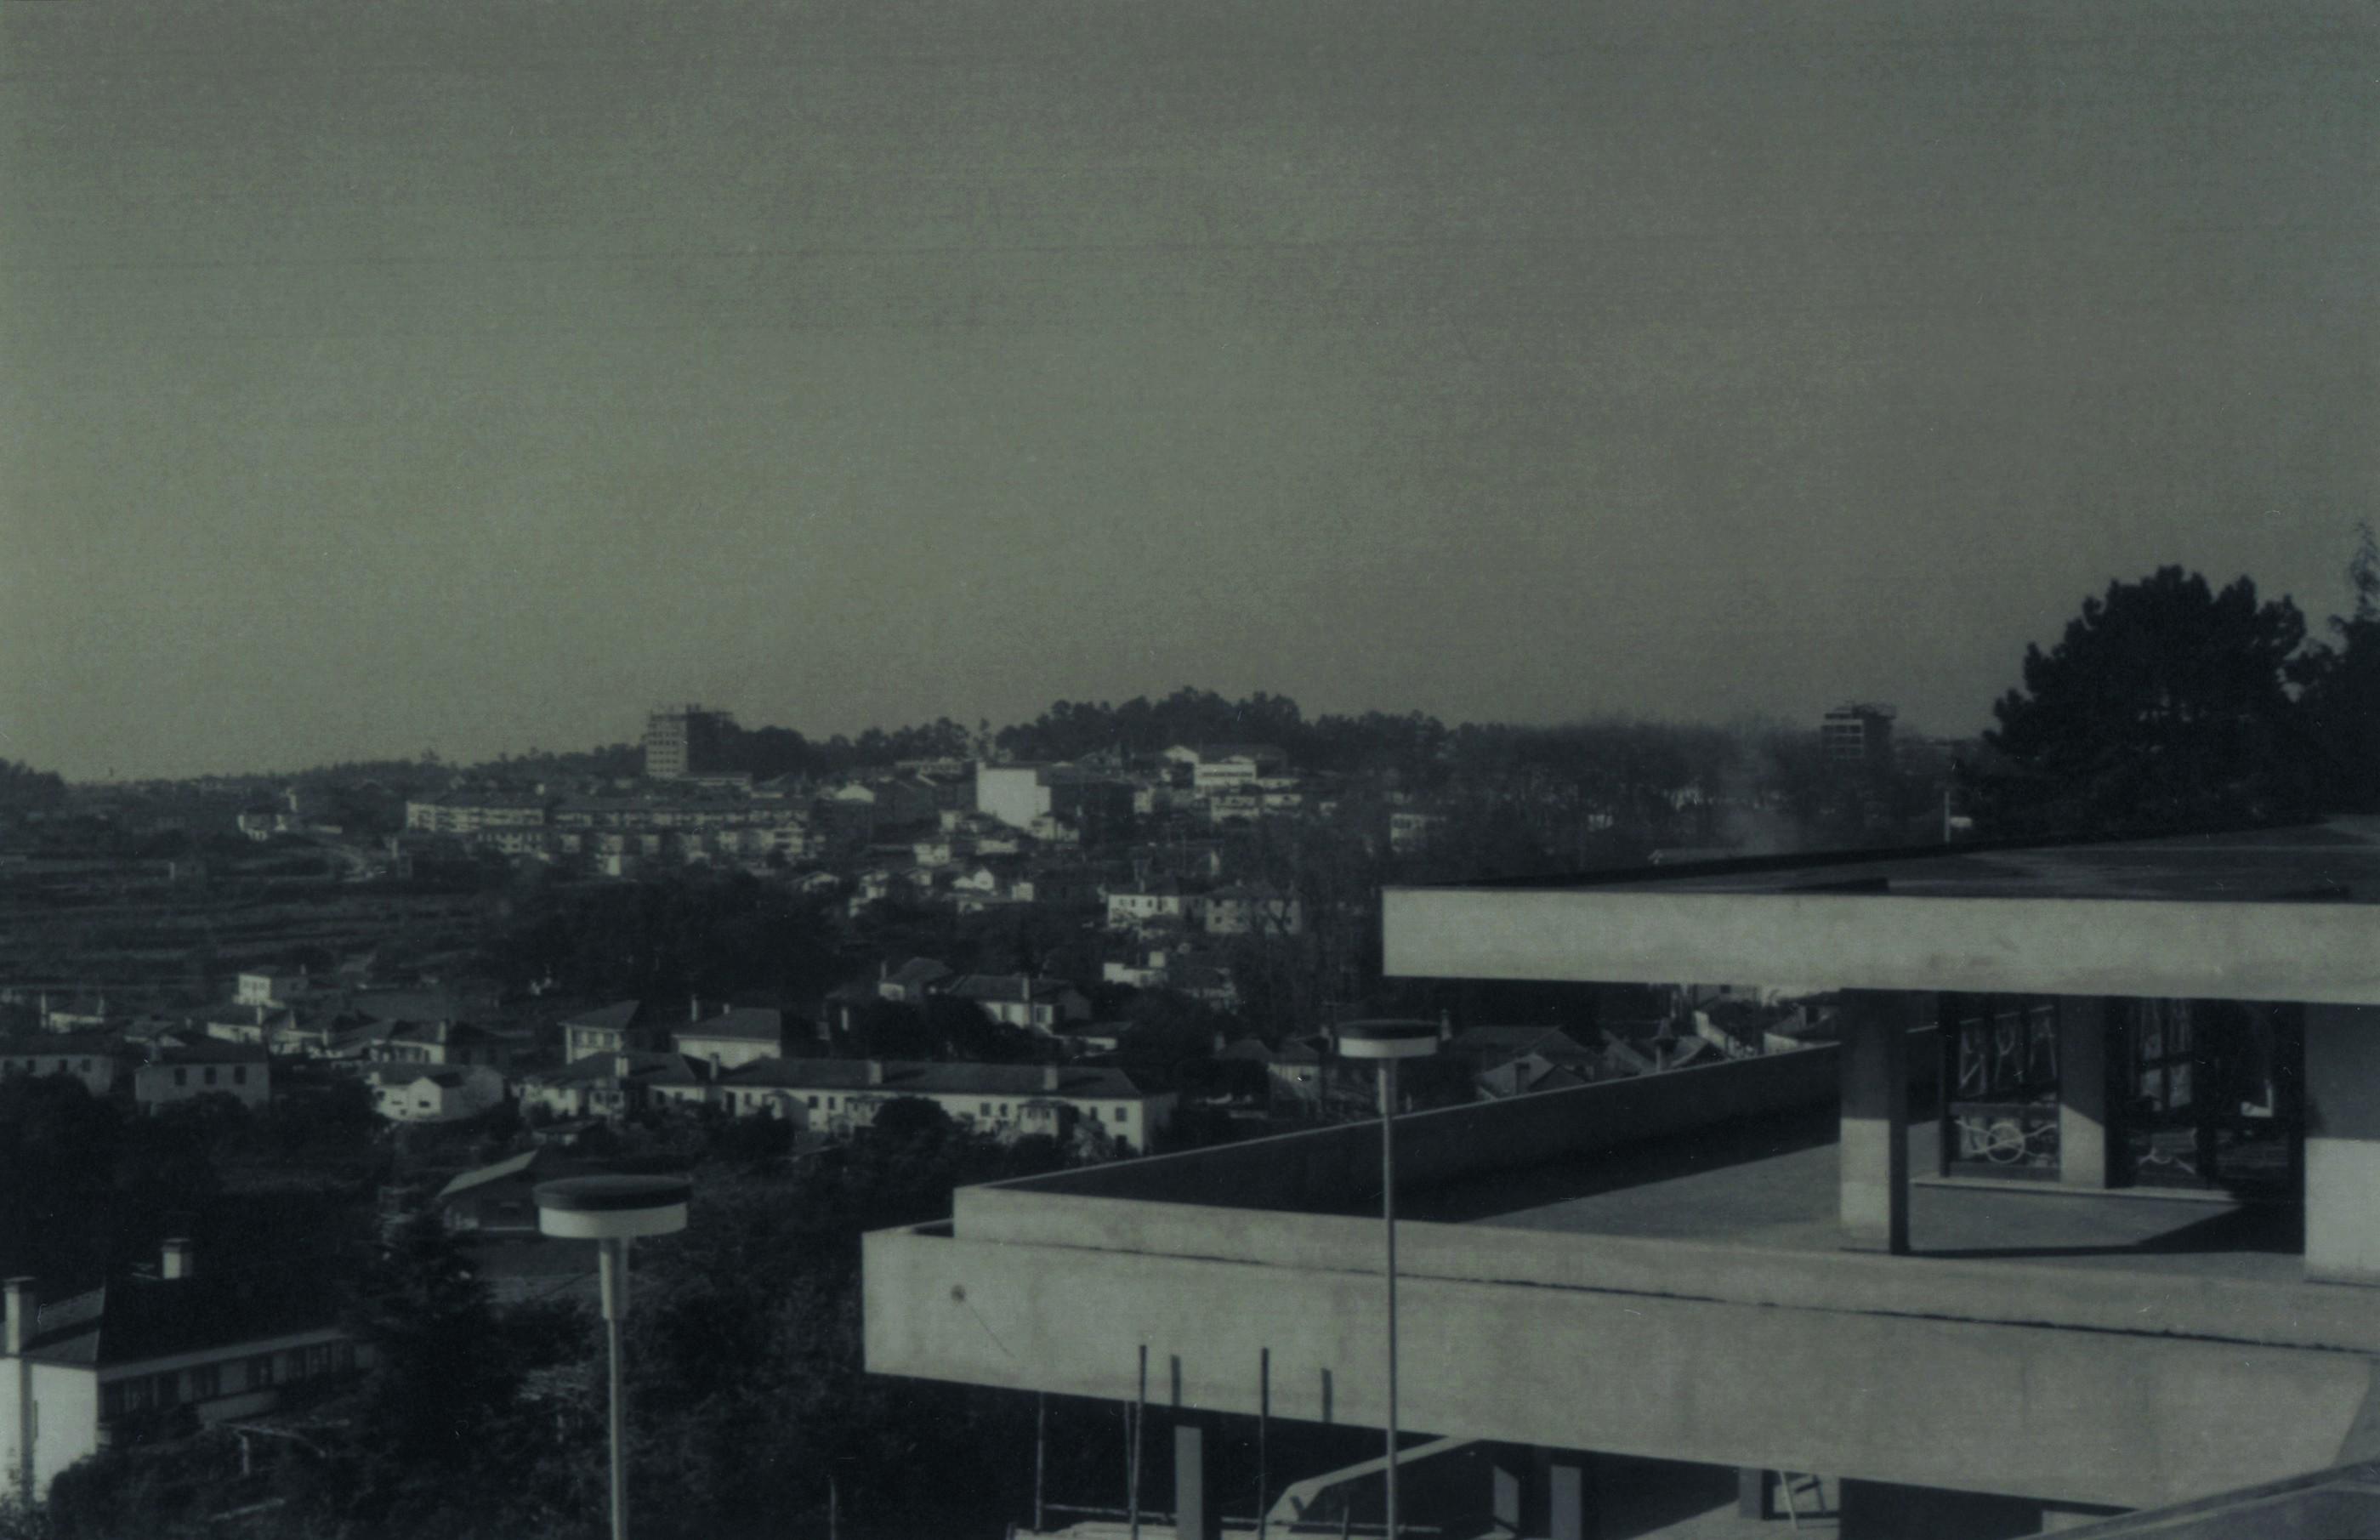 Vista geral (1968)